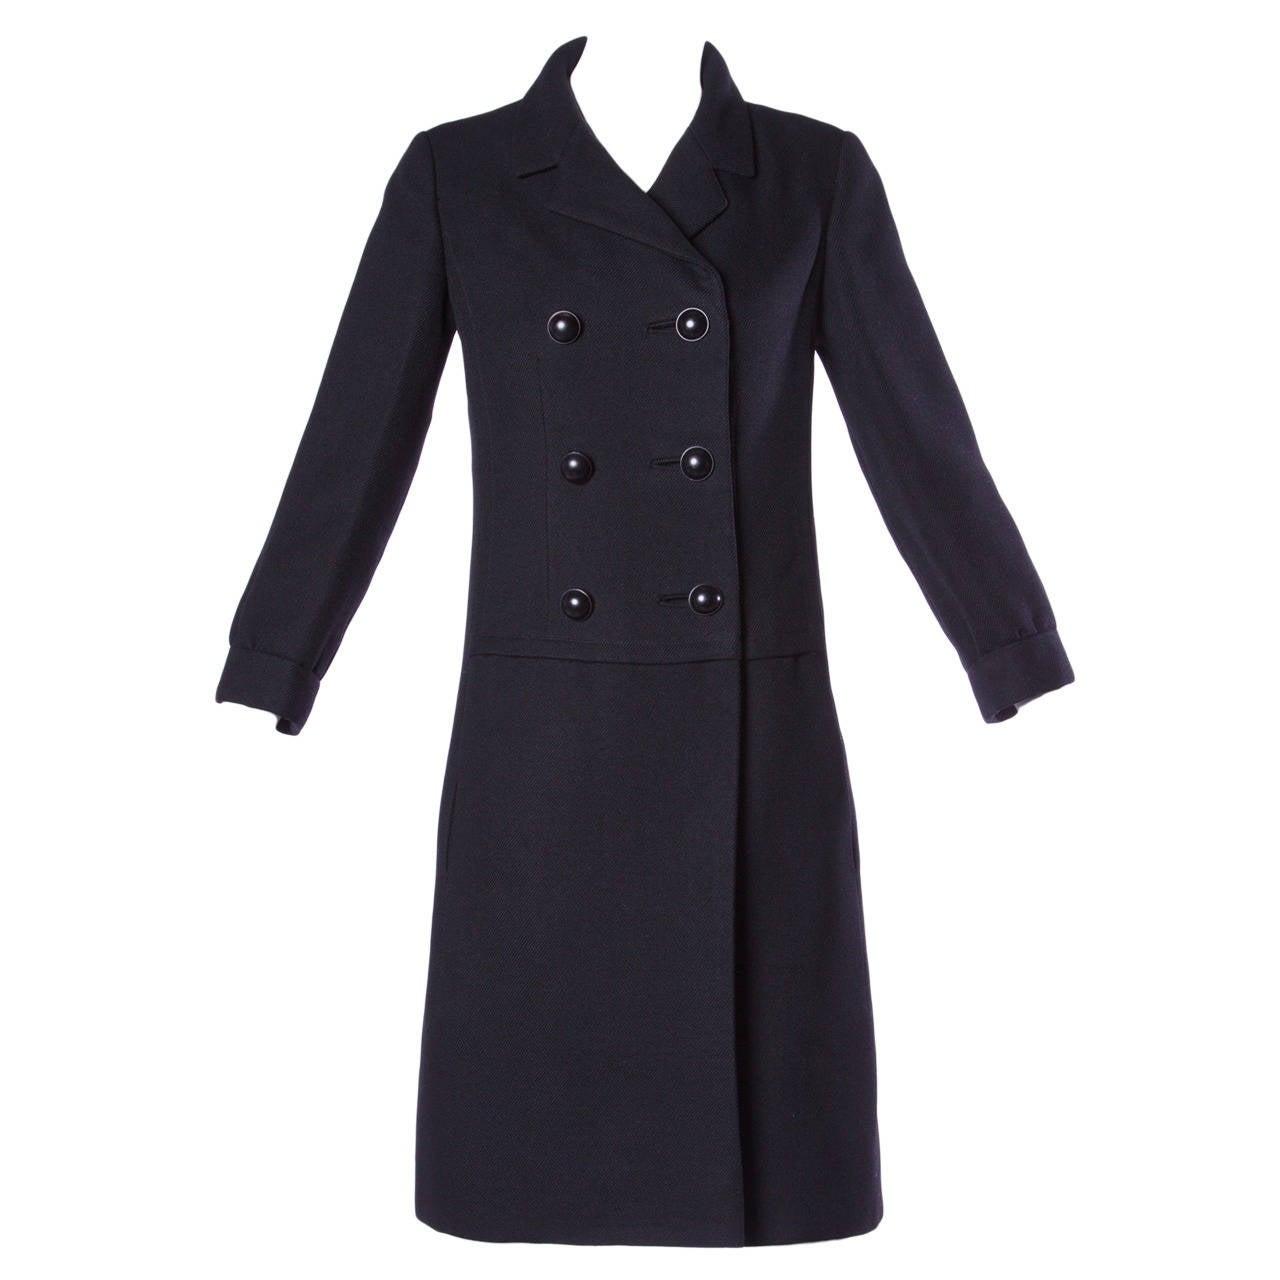 Christian Dior Vintage 1960s 60s Pristine Black Wool Pea Coat At 1stdibs